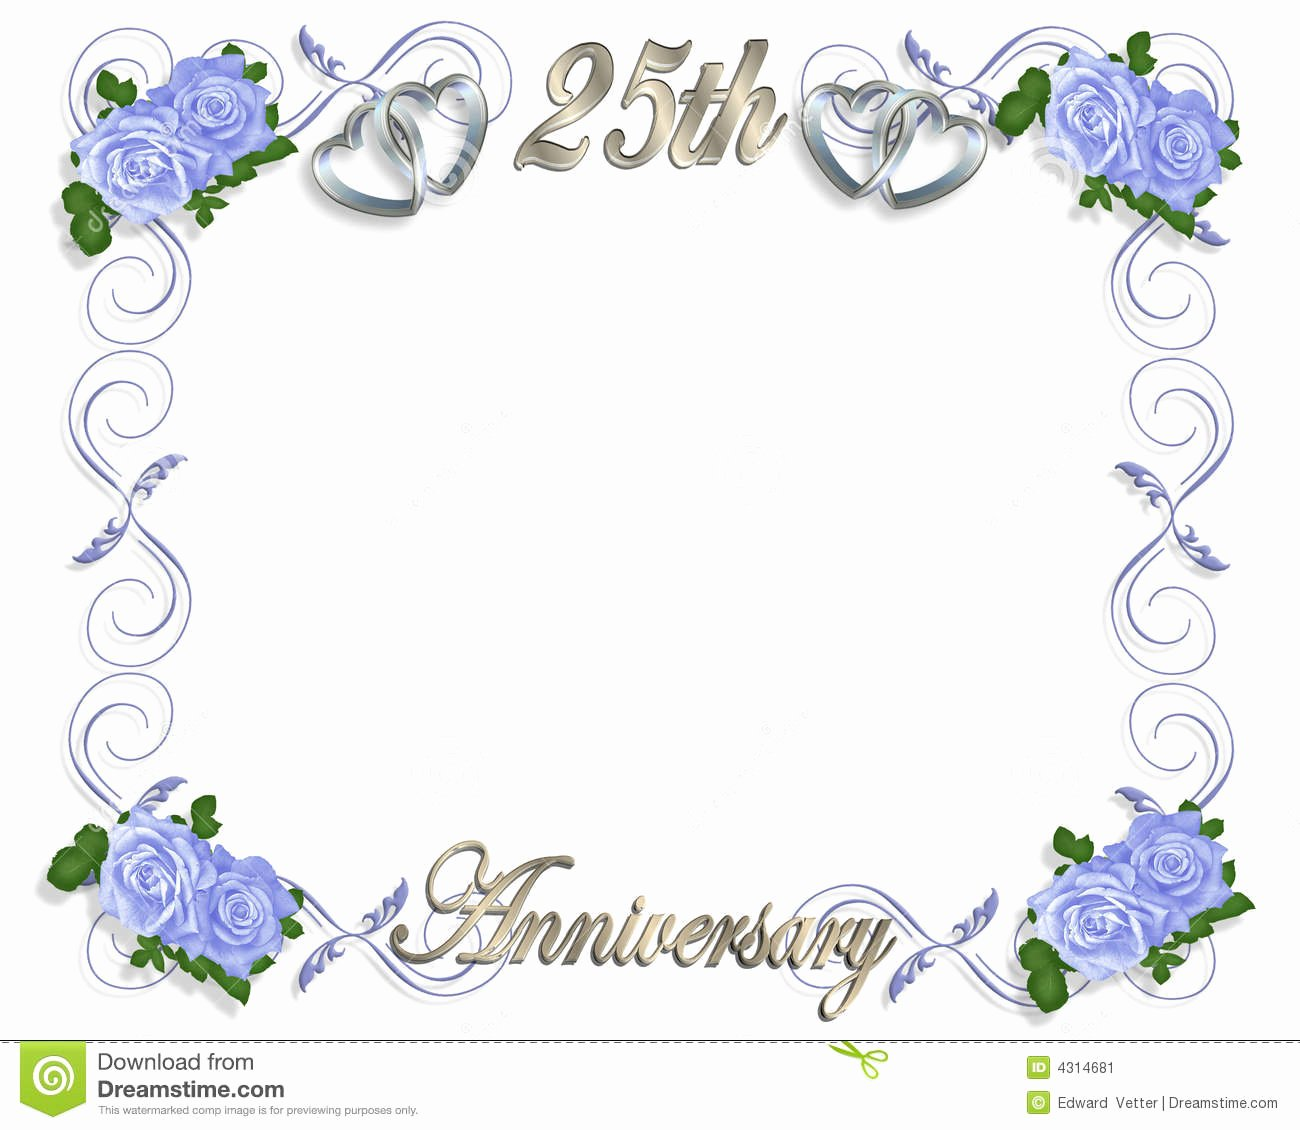 Wedding Anniversary Invitation Template Fresh 25th Wedding Anniversary Invitations Templates